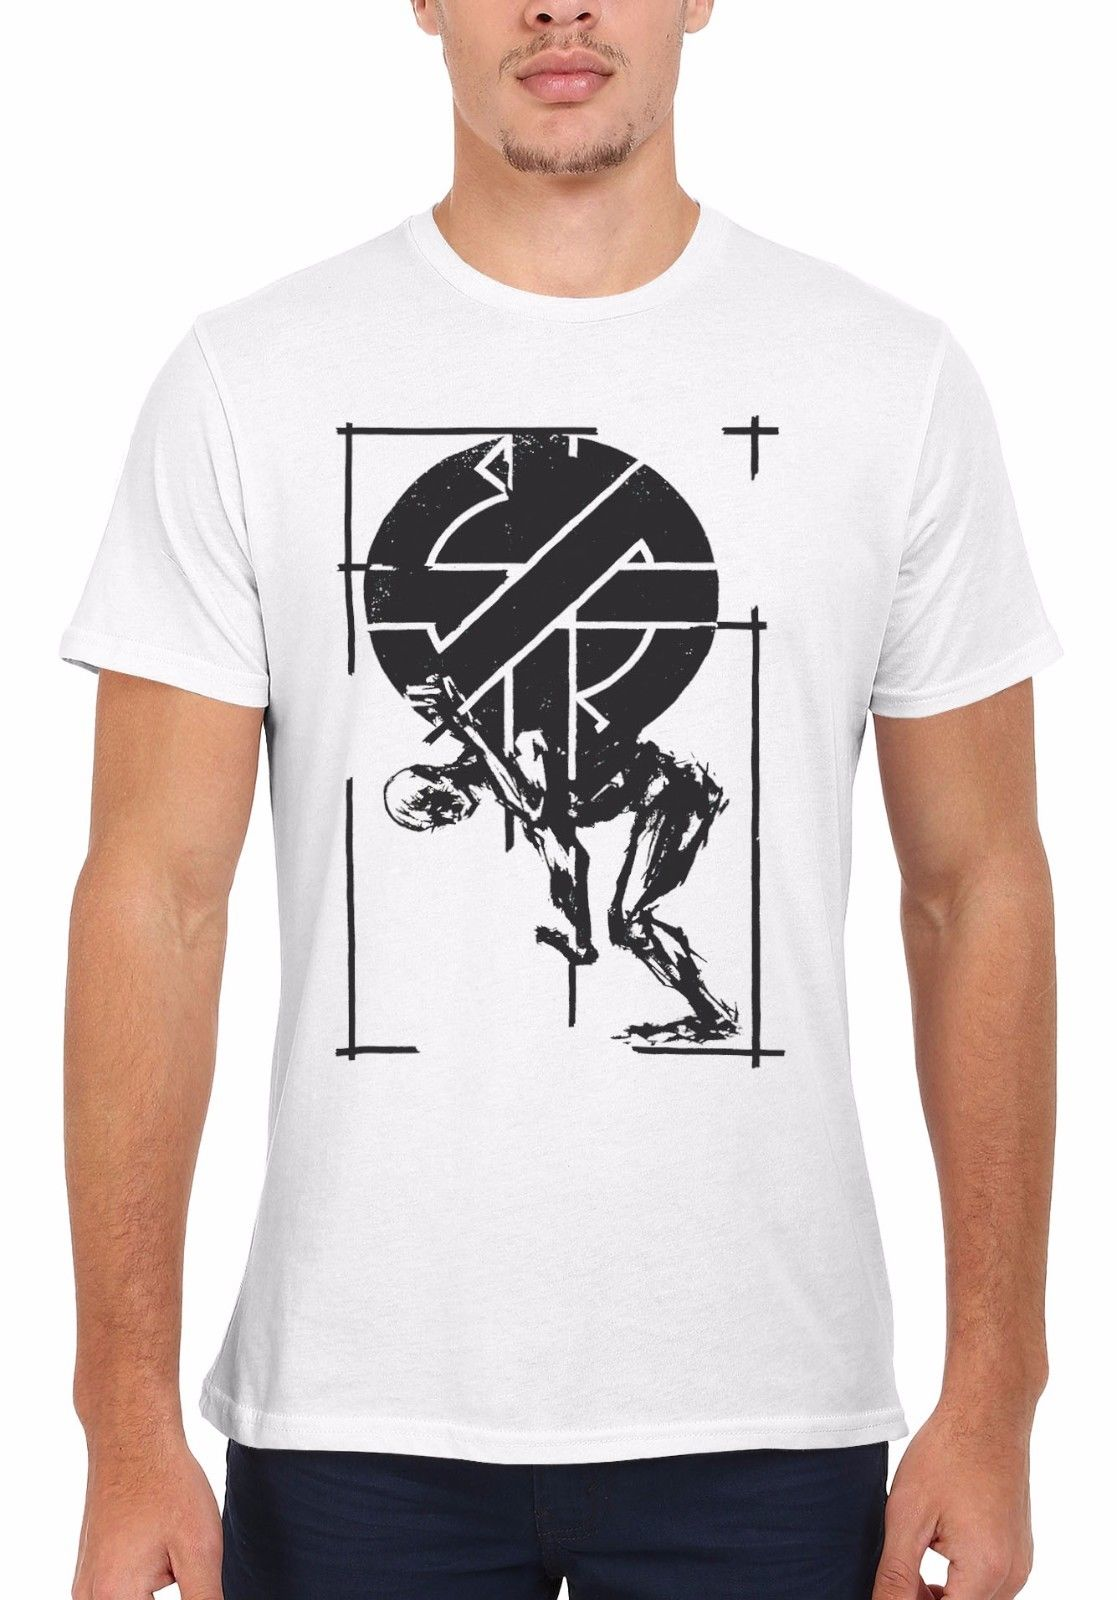 Crass Anarchy Punk Rock Music Cool Men Women Vest  Top Unisex T Shirt 1812 Print Summer Fashion Classic